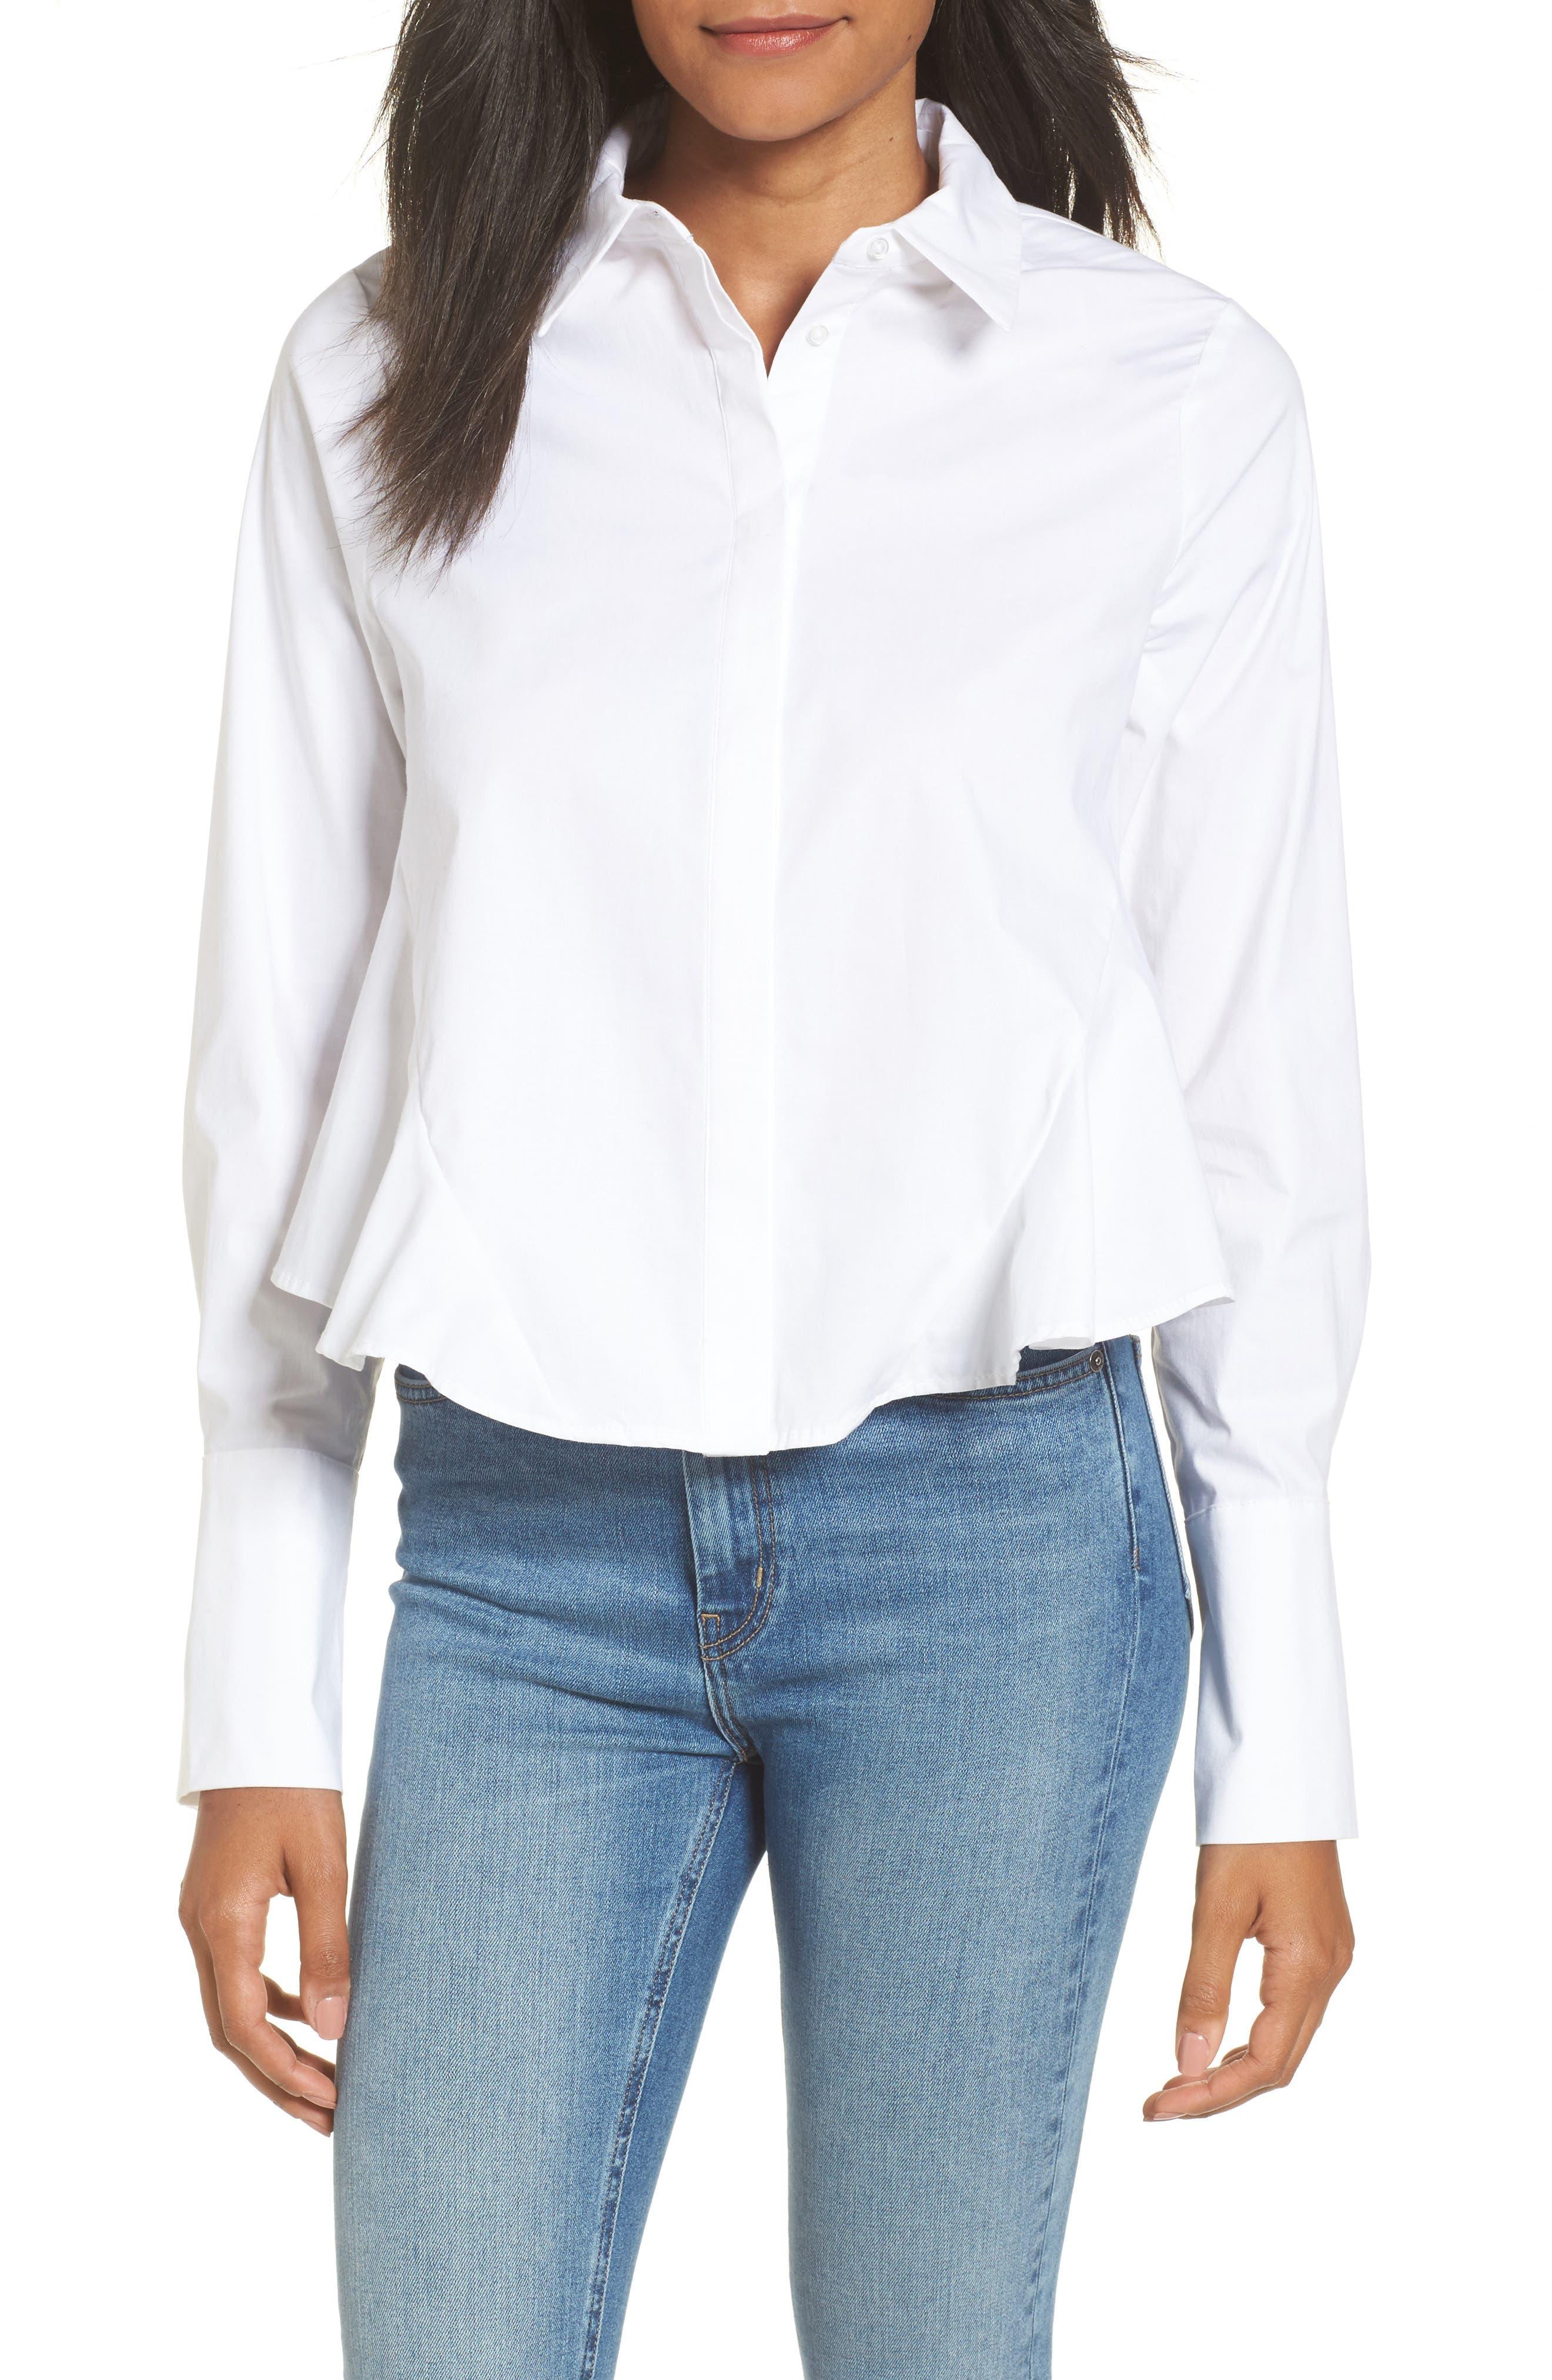 Asher Crop Shirt,                         Main,                         color, Blanc